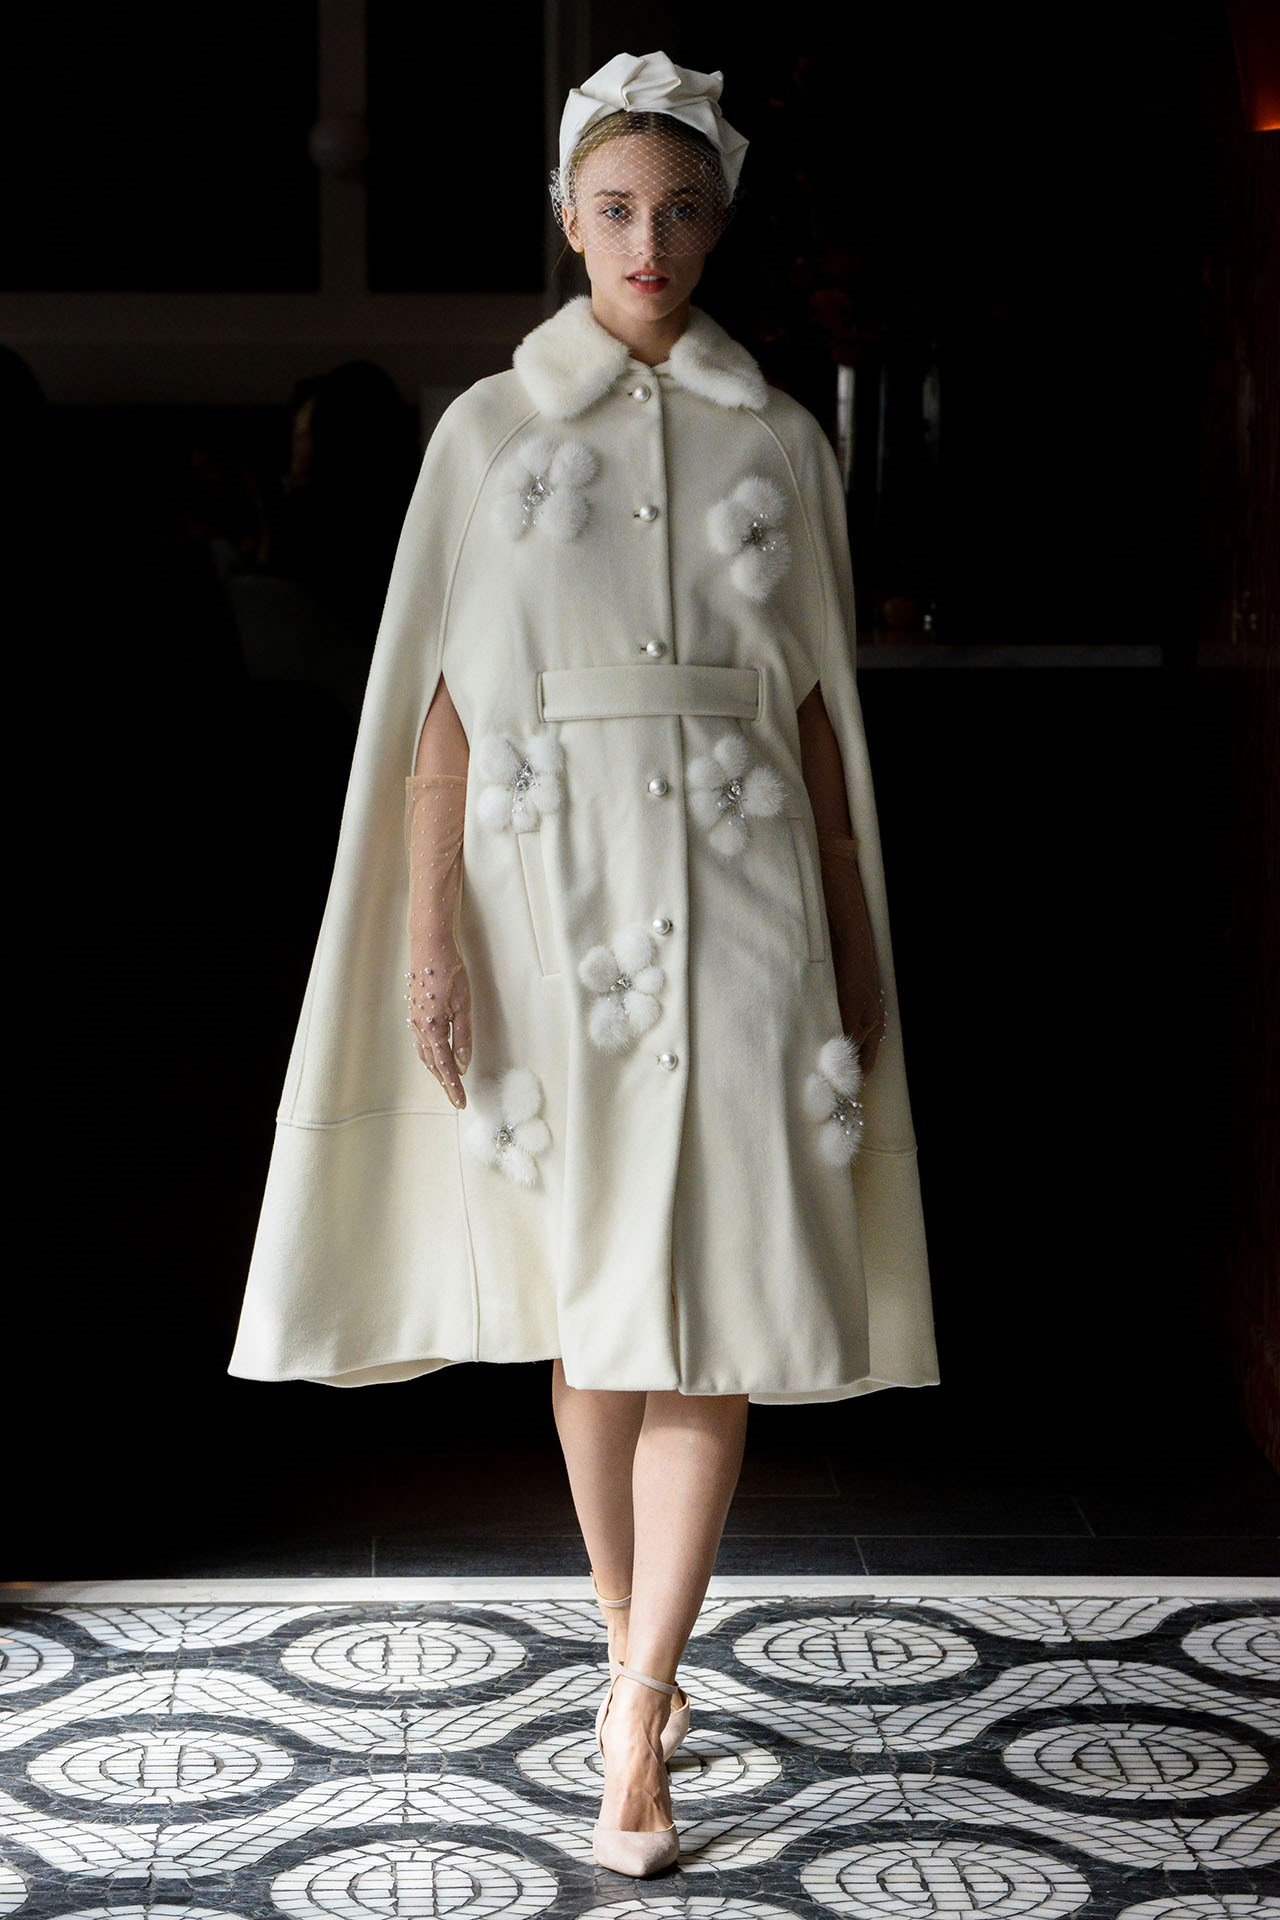 tendencia-vestido-noiva-2018-capa-Lela-Rose